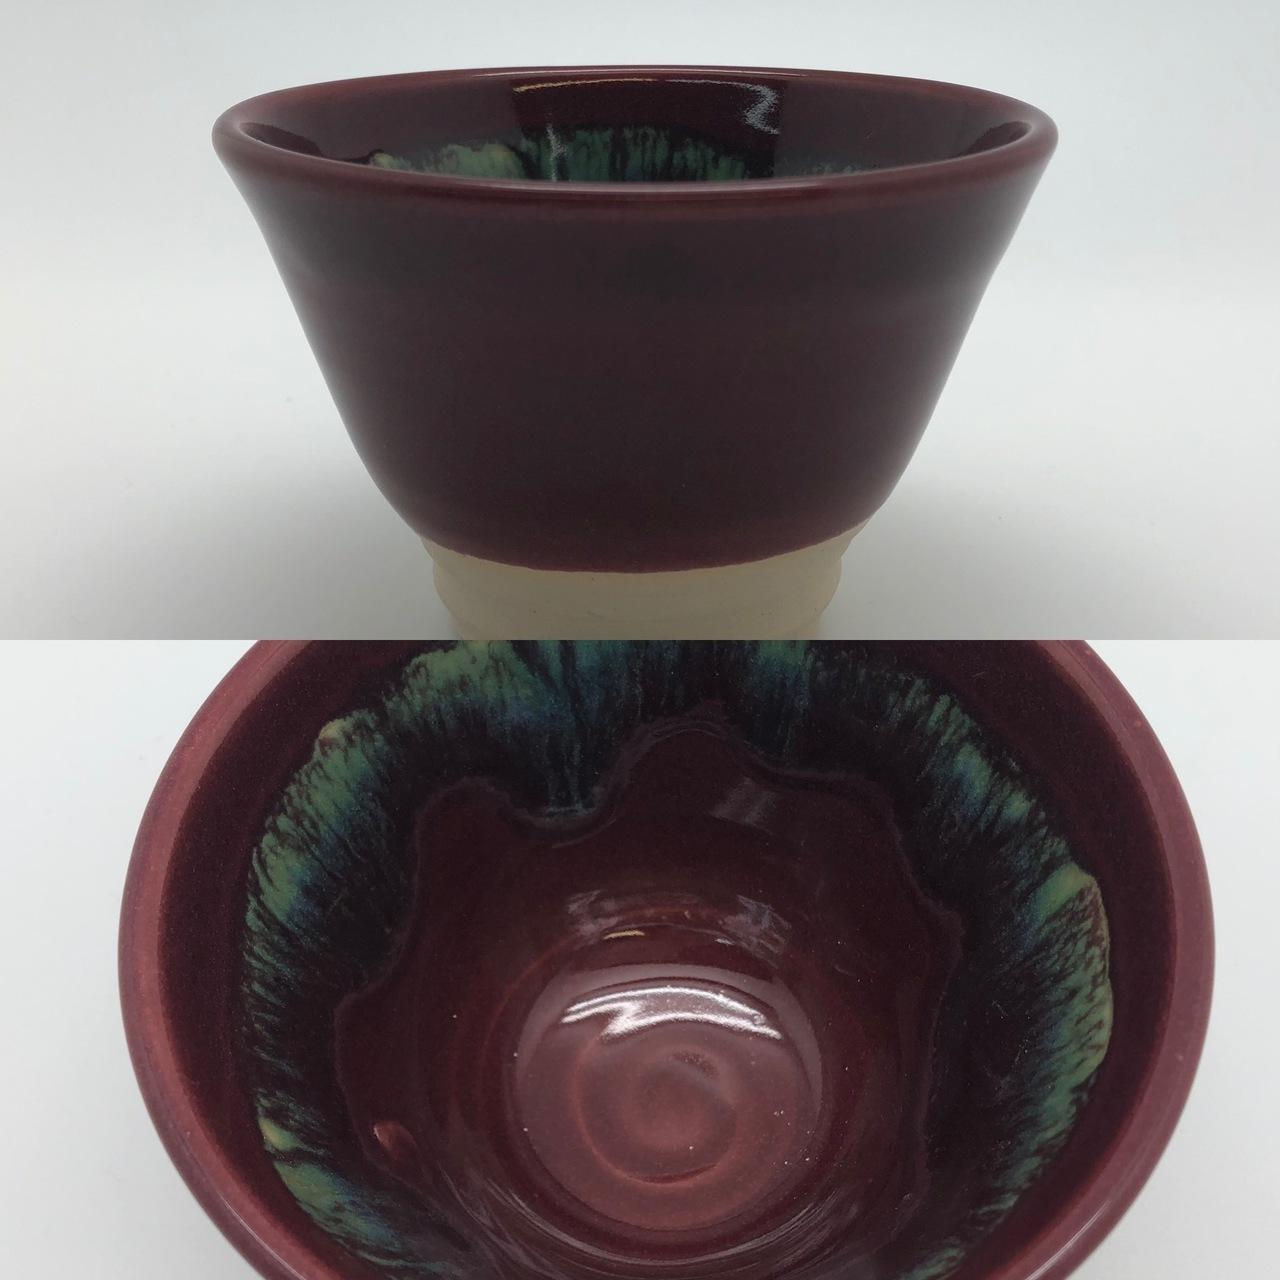 Burgundy Bowl with Green Splash Interior